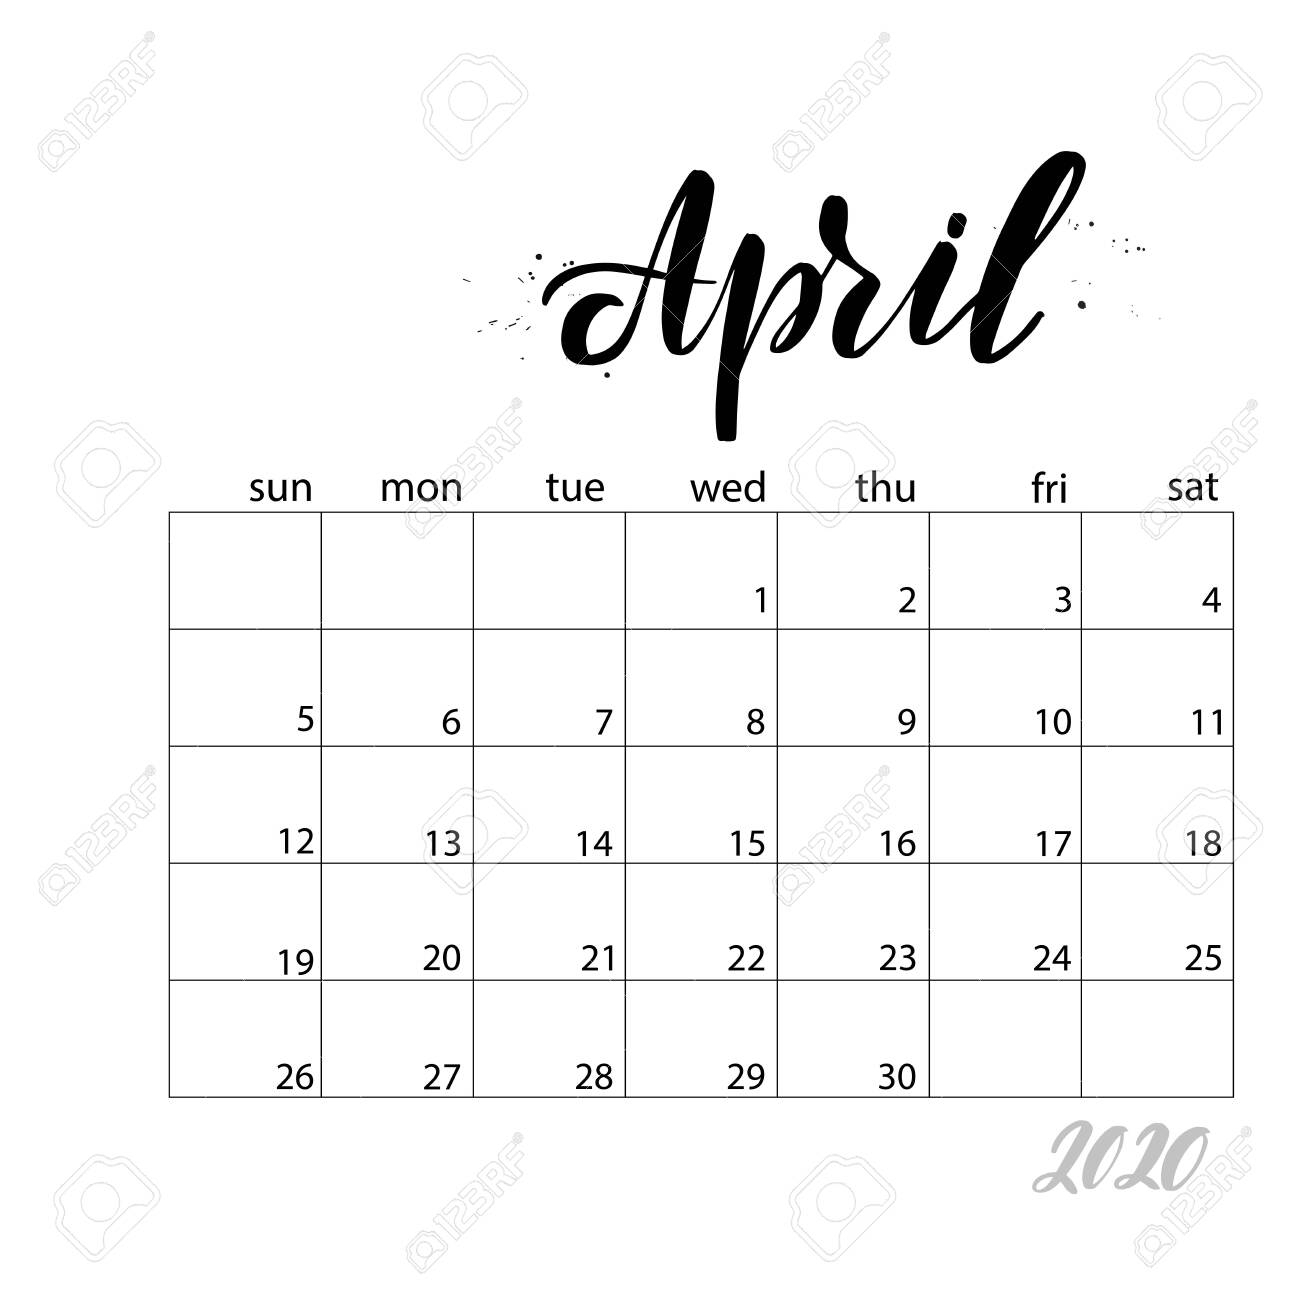 April. Monthly Calendar For 2020 Year. Handwritten Modern Calligraphy..